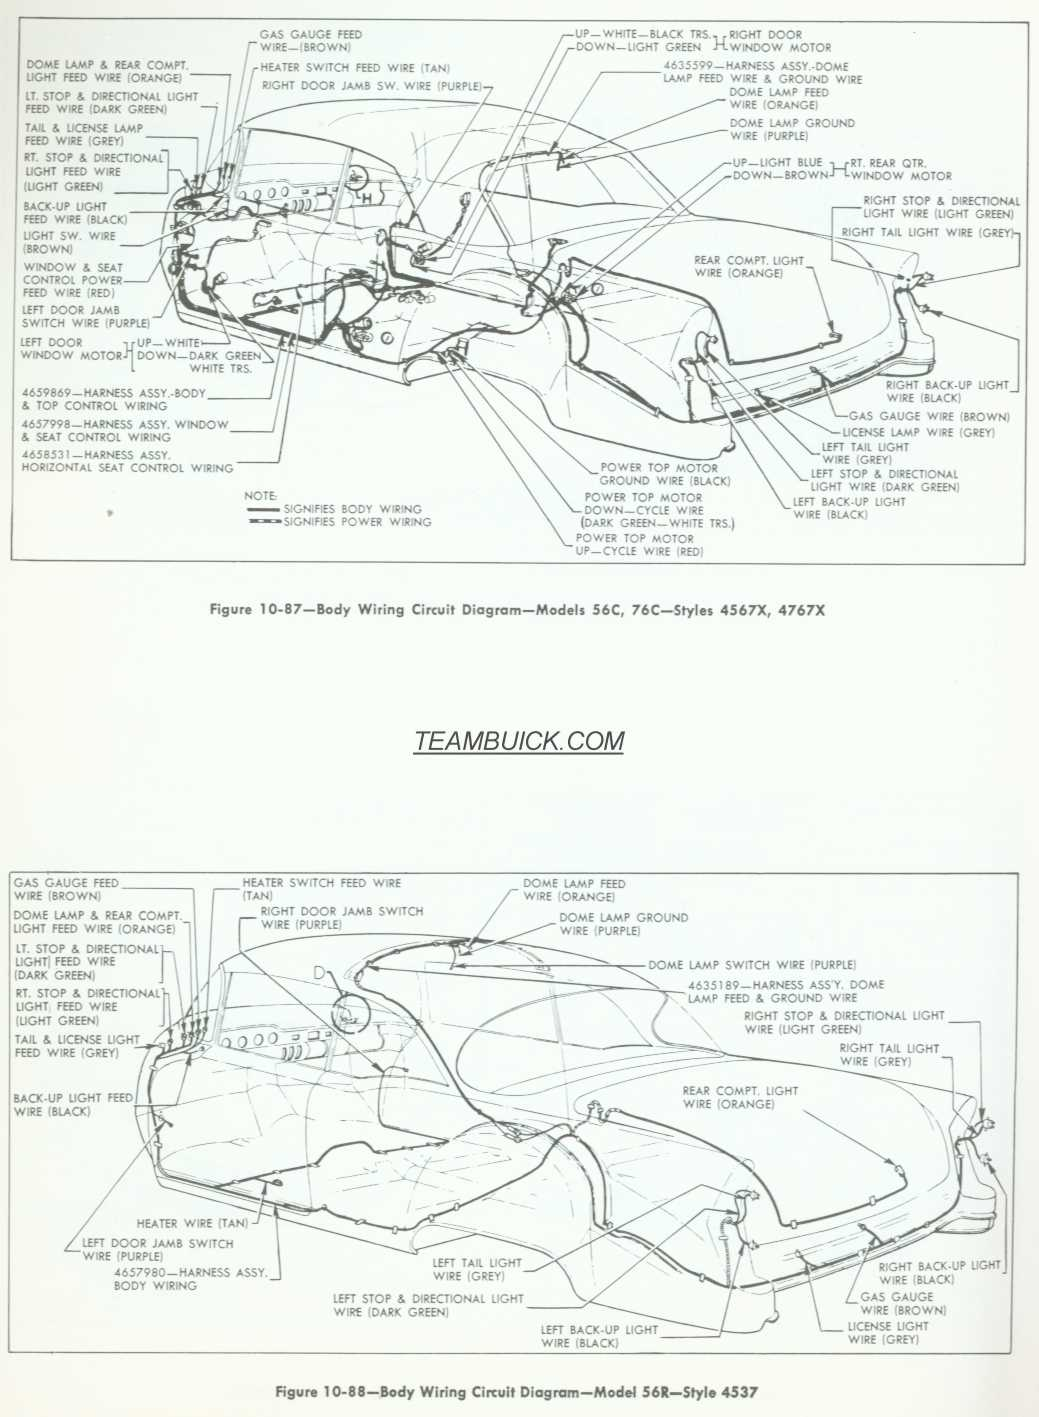 Resume 55 Buick Wiring Diagram Resume Examples | Resume ... on